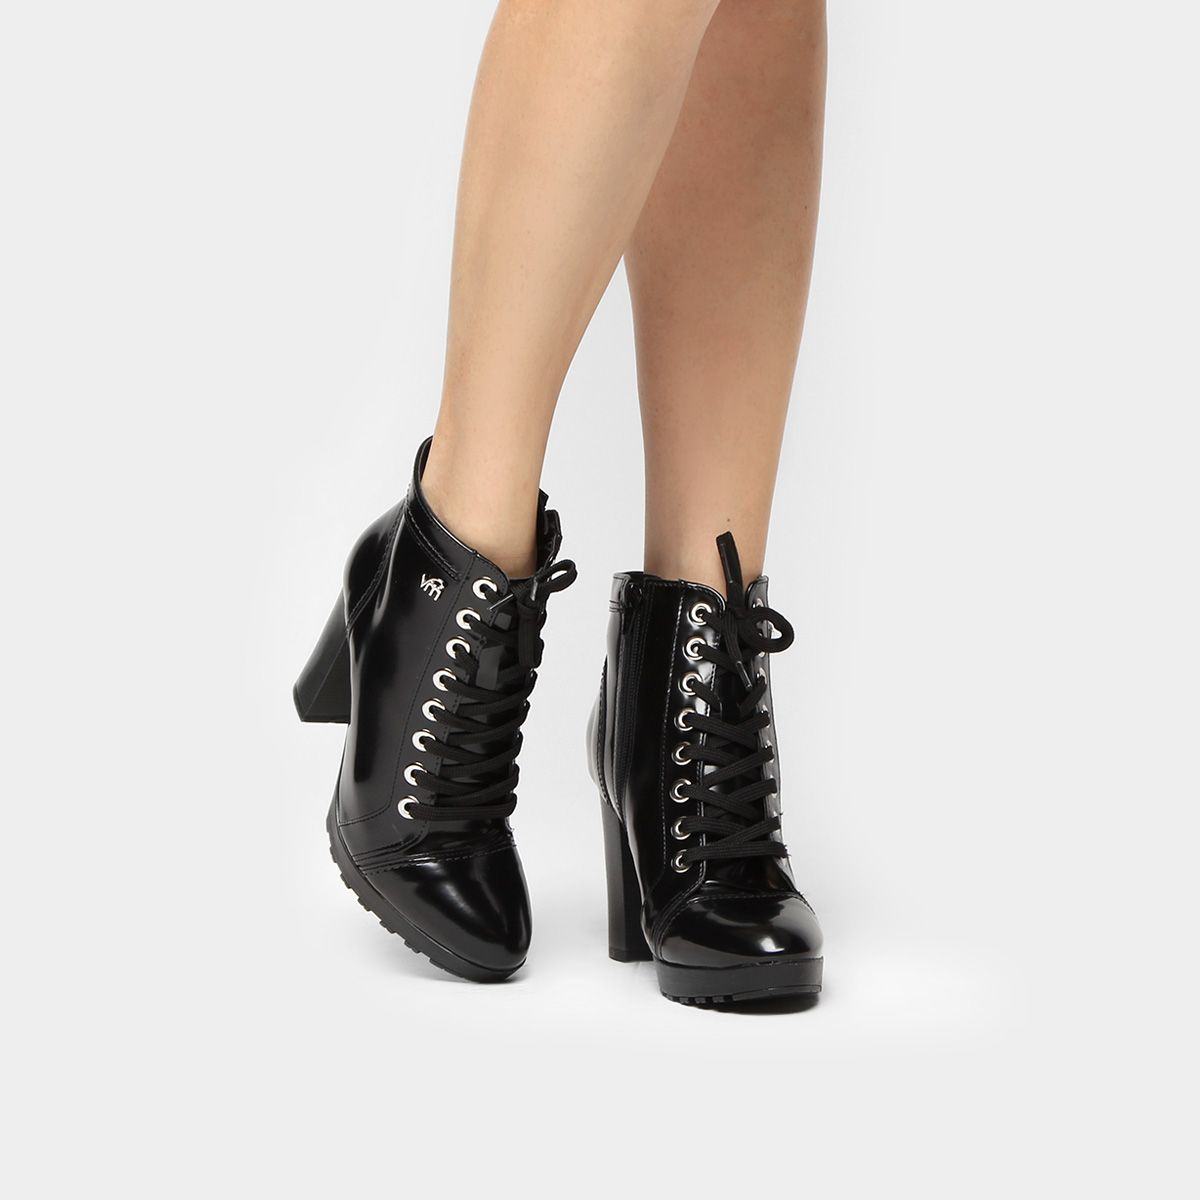 56c3a91c6 Compre Bota Coturno Via Marte Tratorada Feminina Preto na Zattini a nova  loja de moda online